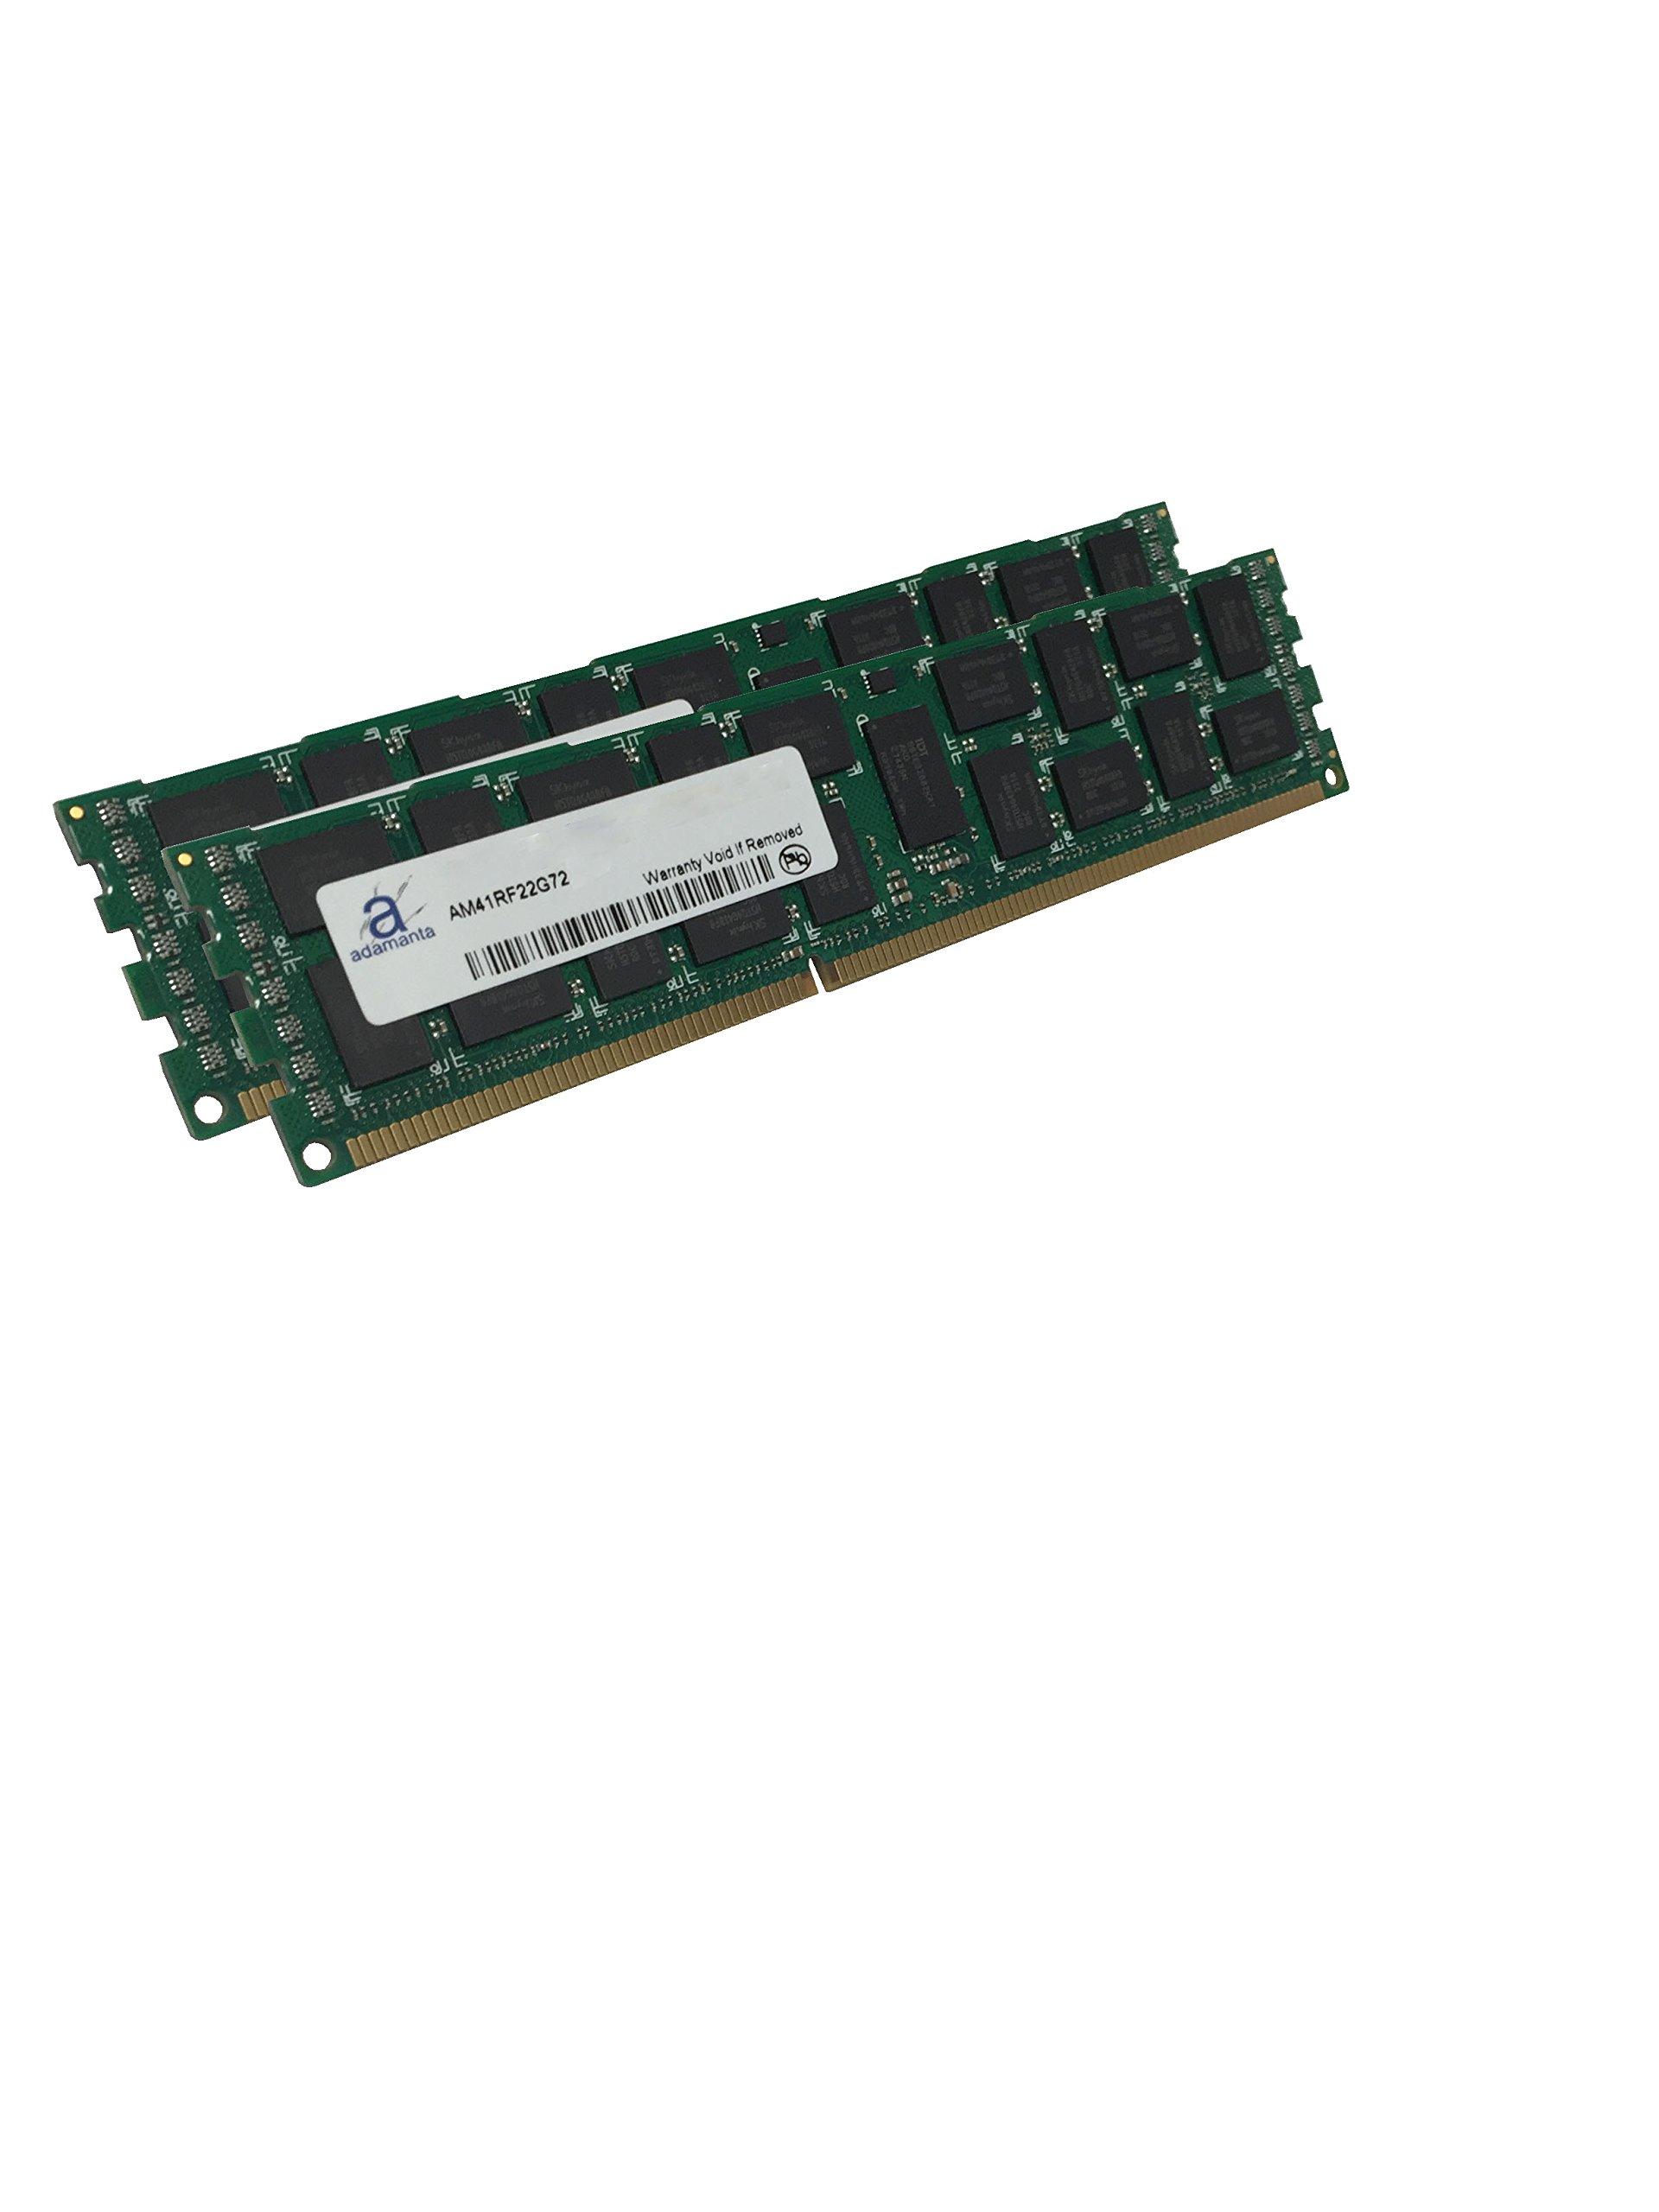 Adamanta 32GB (2x16GB) Server Memory Upgrade for Dell PowerEdge T320 DDR3 1600Mhz PC3-12800 ECC Registered 2Rx4 CL11 1.5v by Adamanta Memory (Image #2)